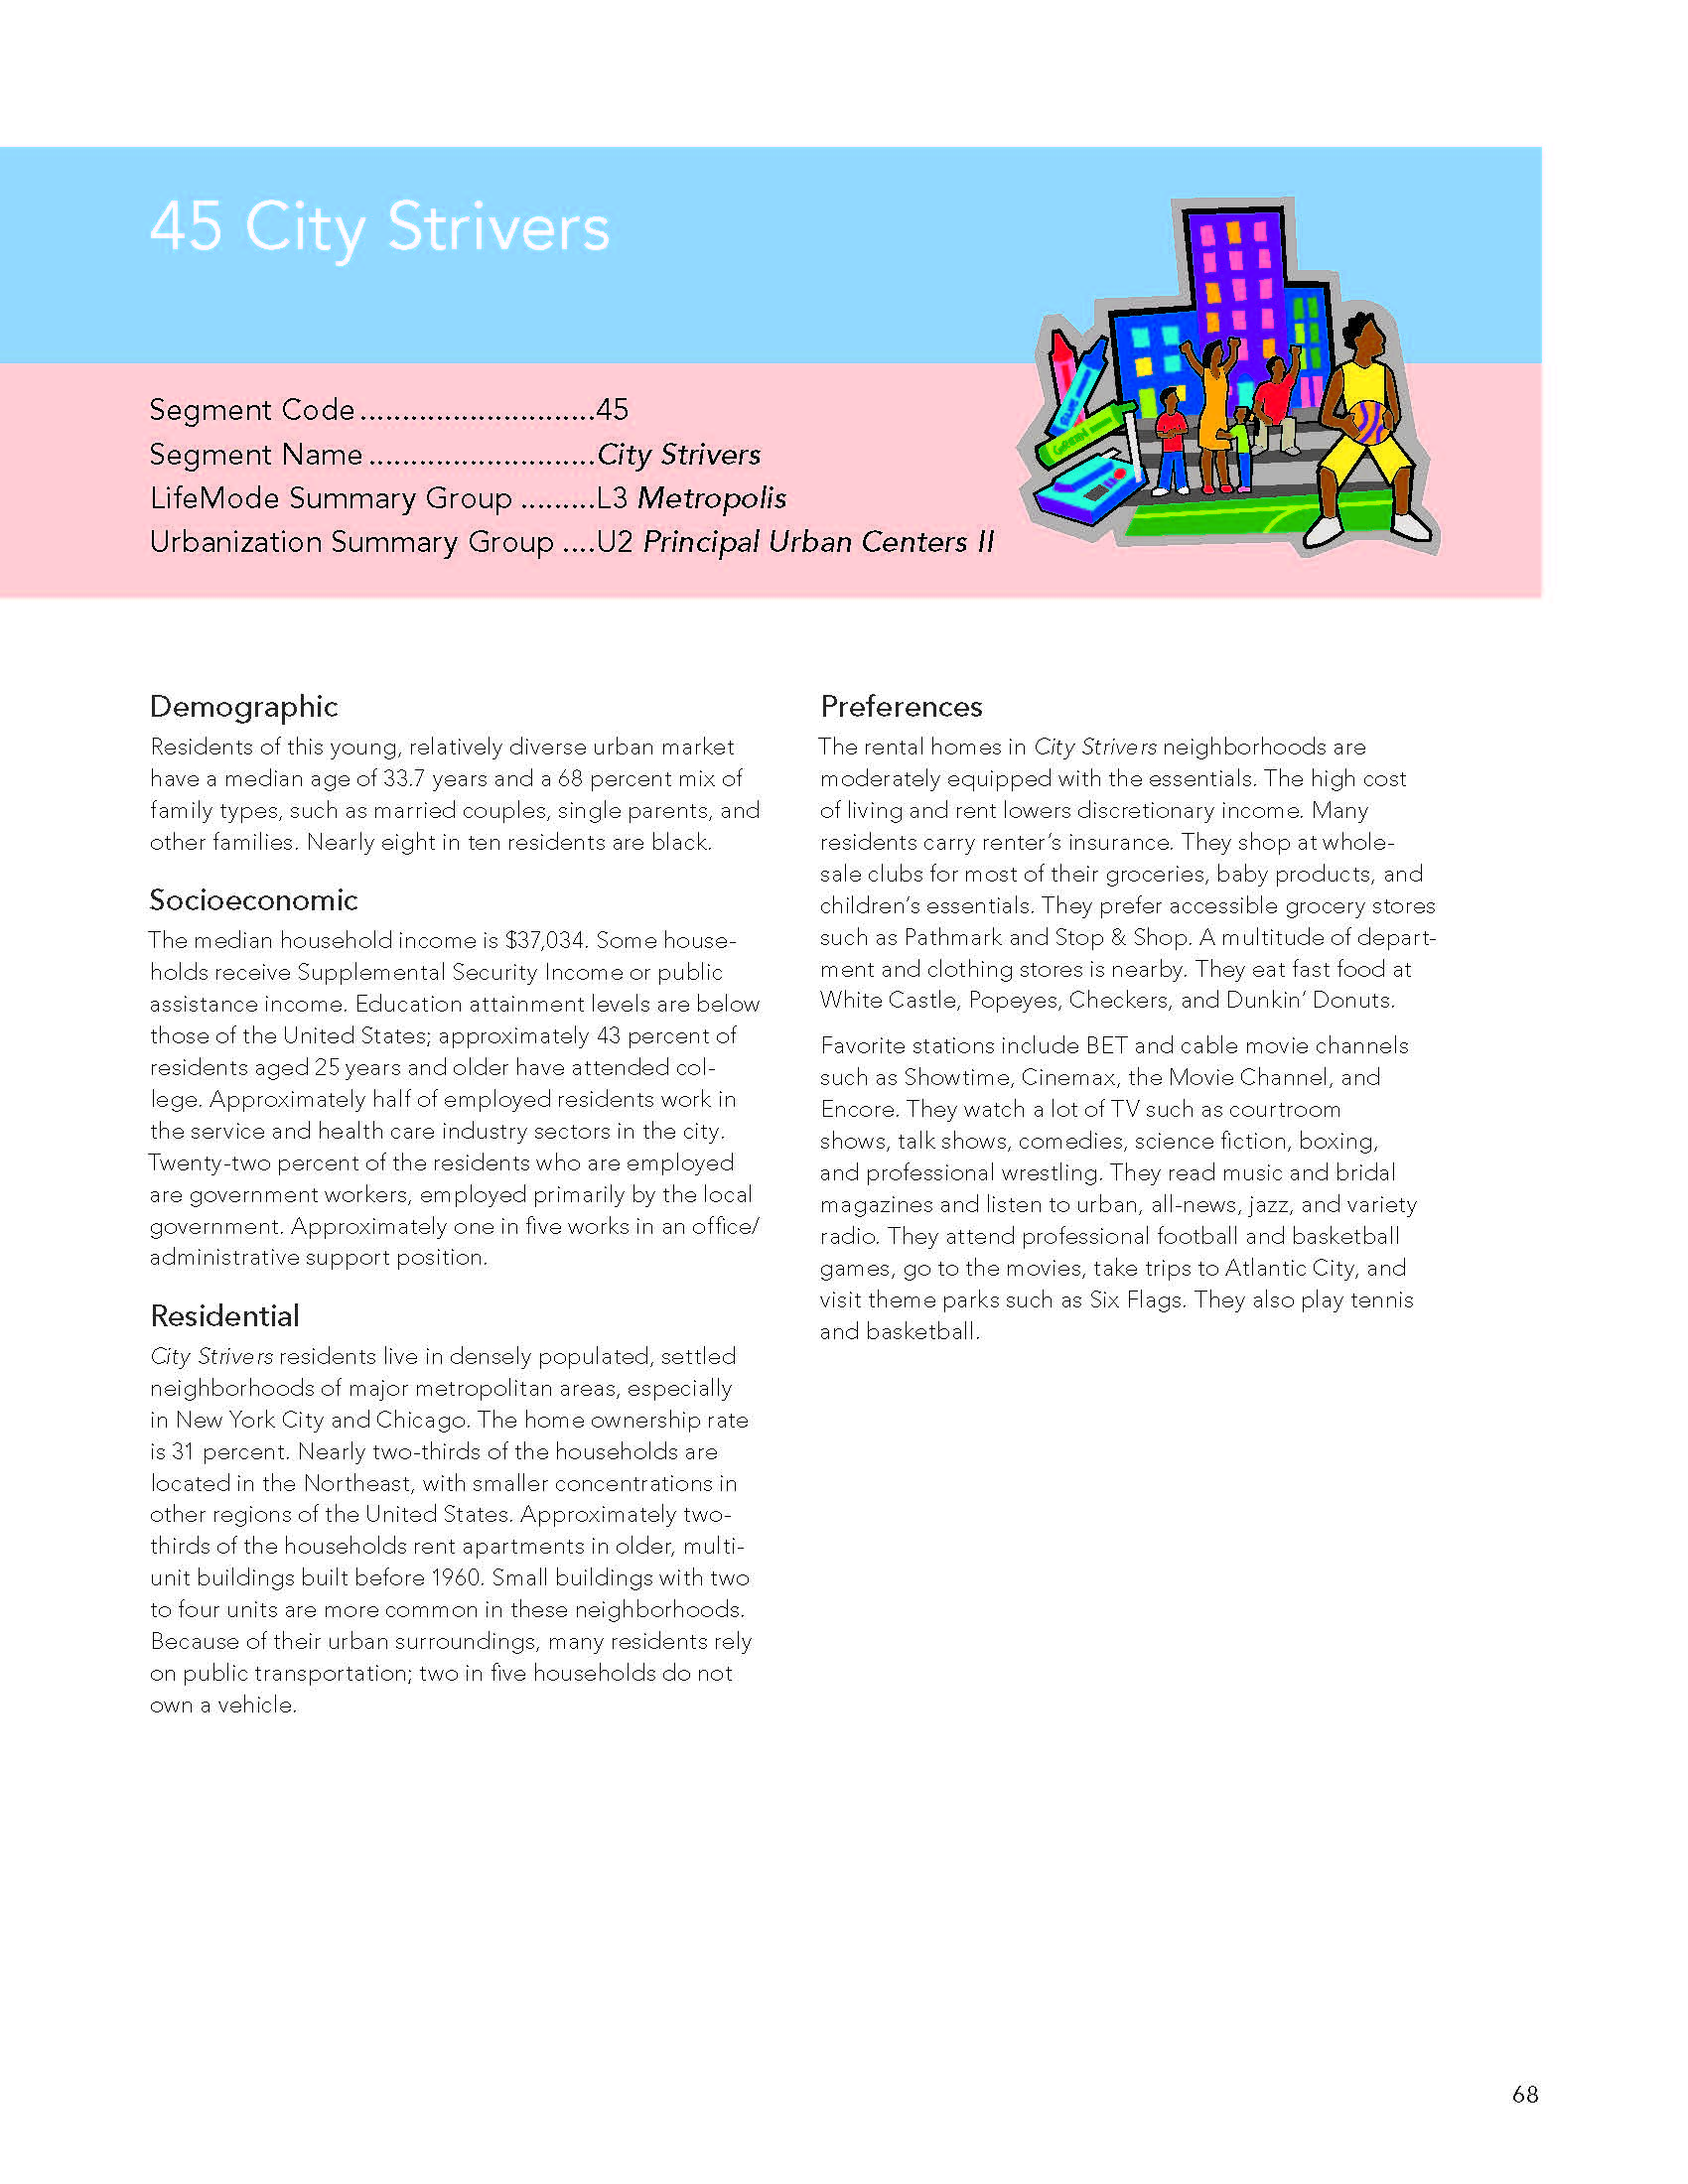 tapestry-segmentation_Page_71.jpg